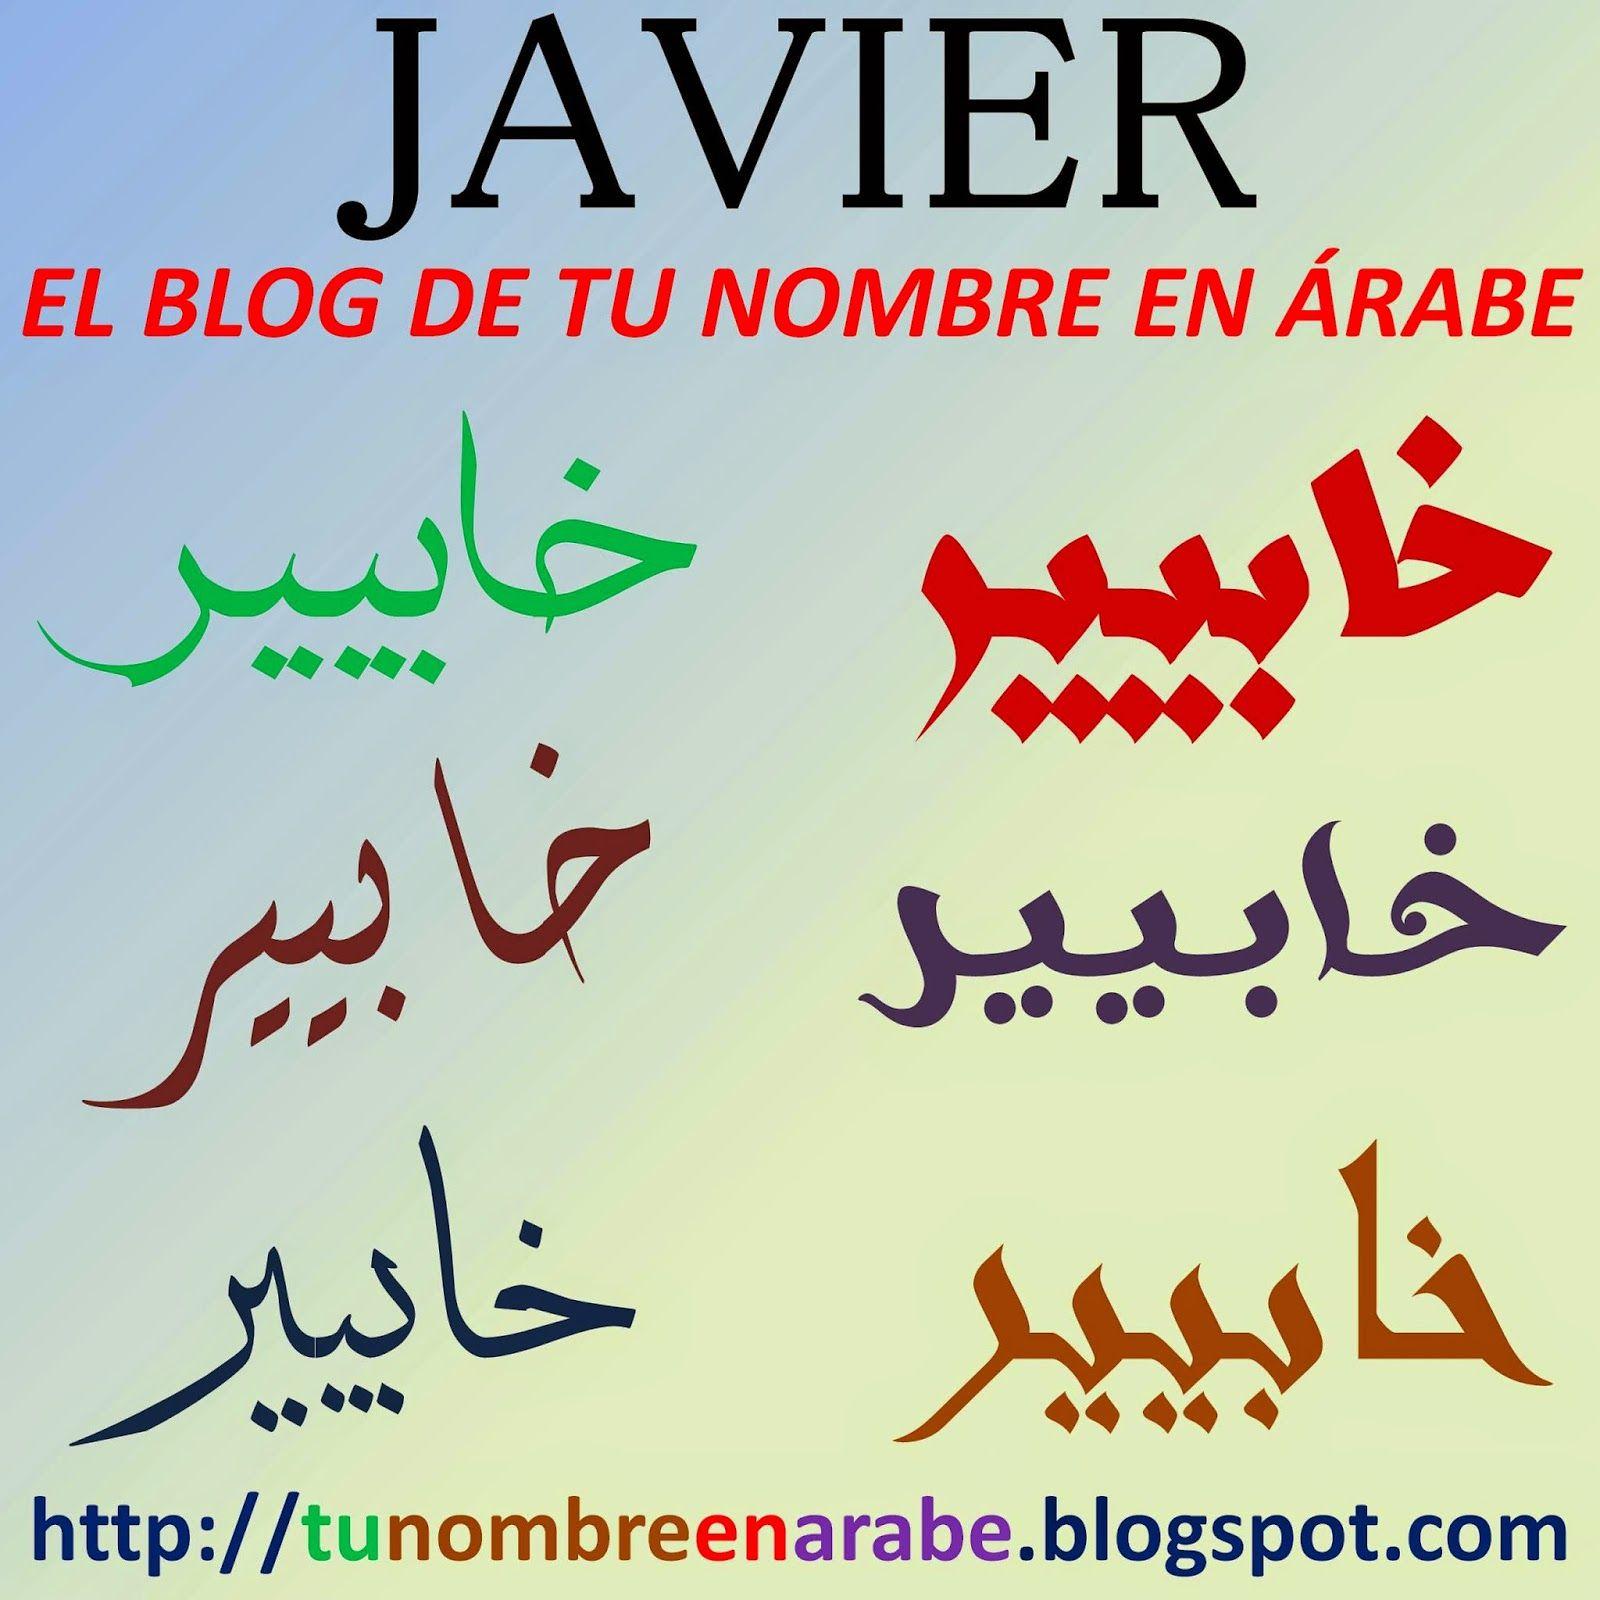 Imagenes De Tu Nombre En Arabe Tatuajes De Nombres Nombres En